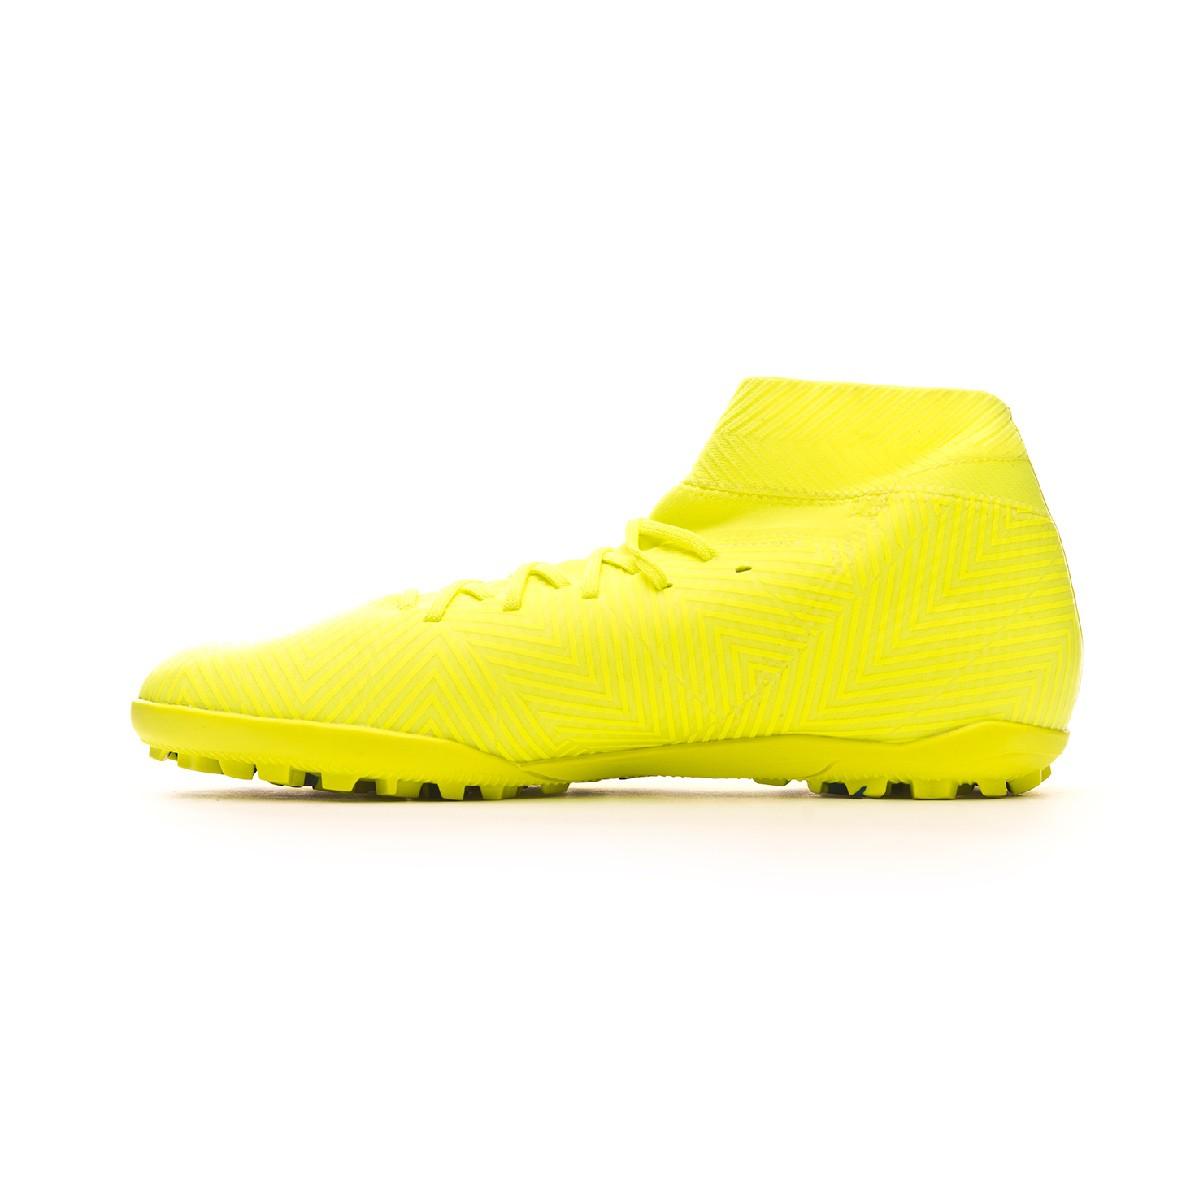 36d1ac2c906 Football Boot adidas Nemeziz Tango 18.3 Turf Solar yellow-Football blue-Active  red - Tienda de fútbol Fútbol Emotion